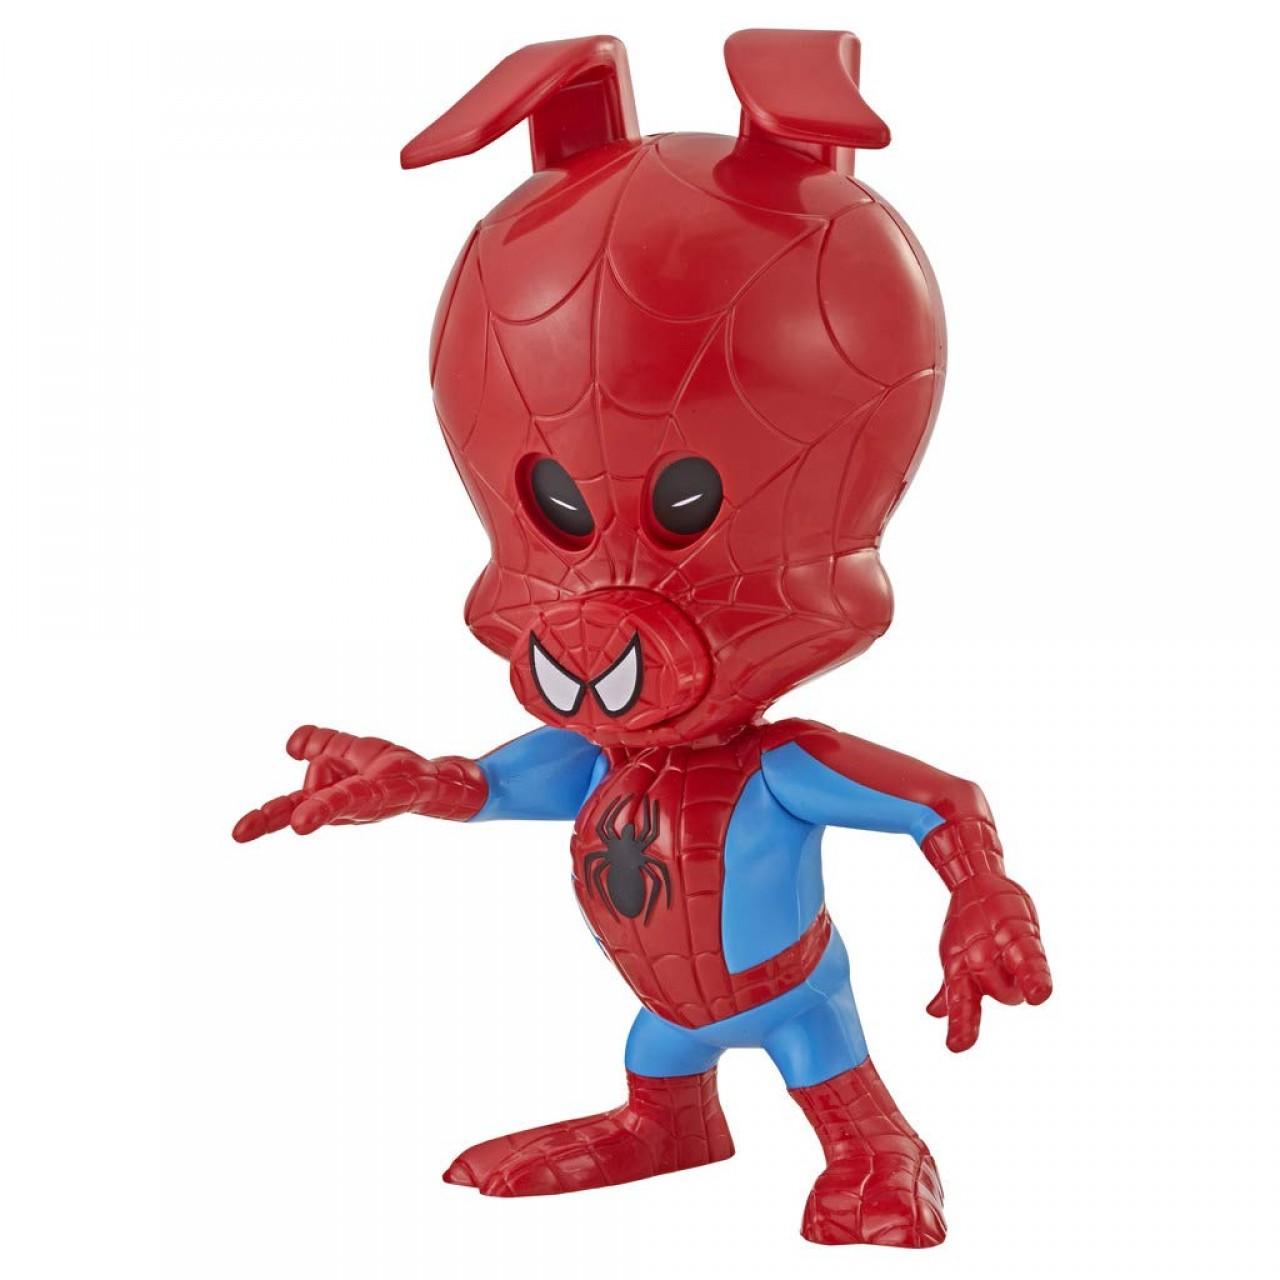 Интерактивная фигурка Свин-паука 21см E2845 от Hasbro (Spider-Ham Action Figures)